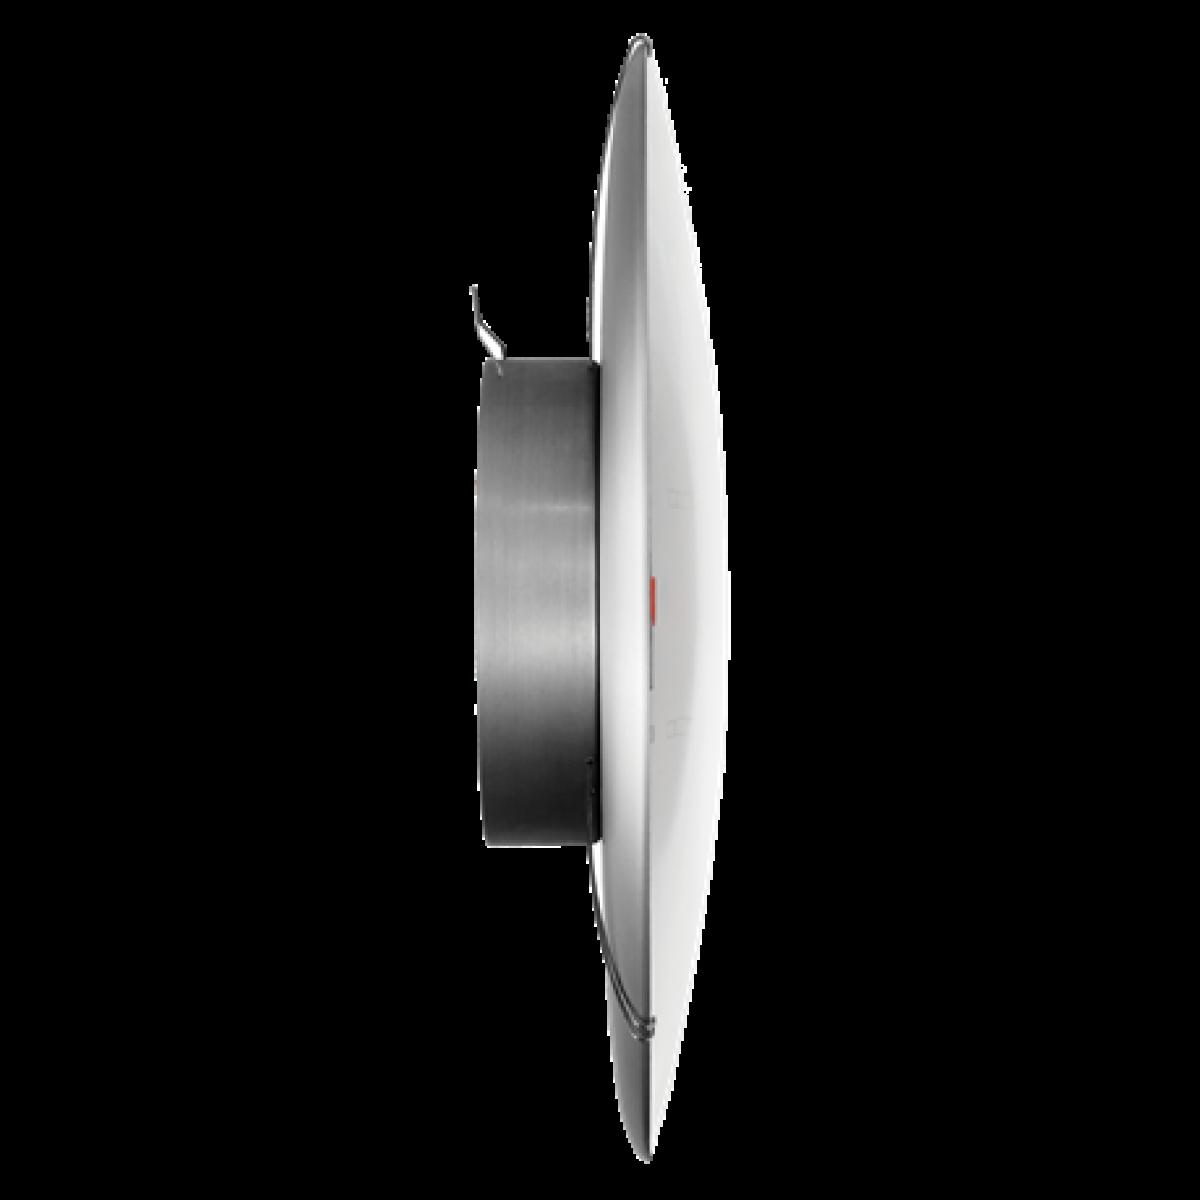 ARNEJACOBSENRomanvgur29cm-07